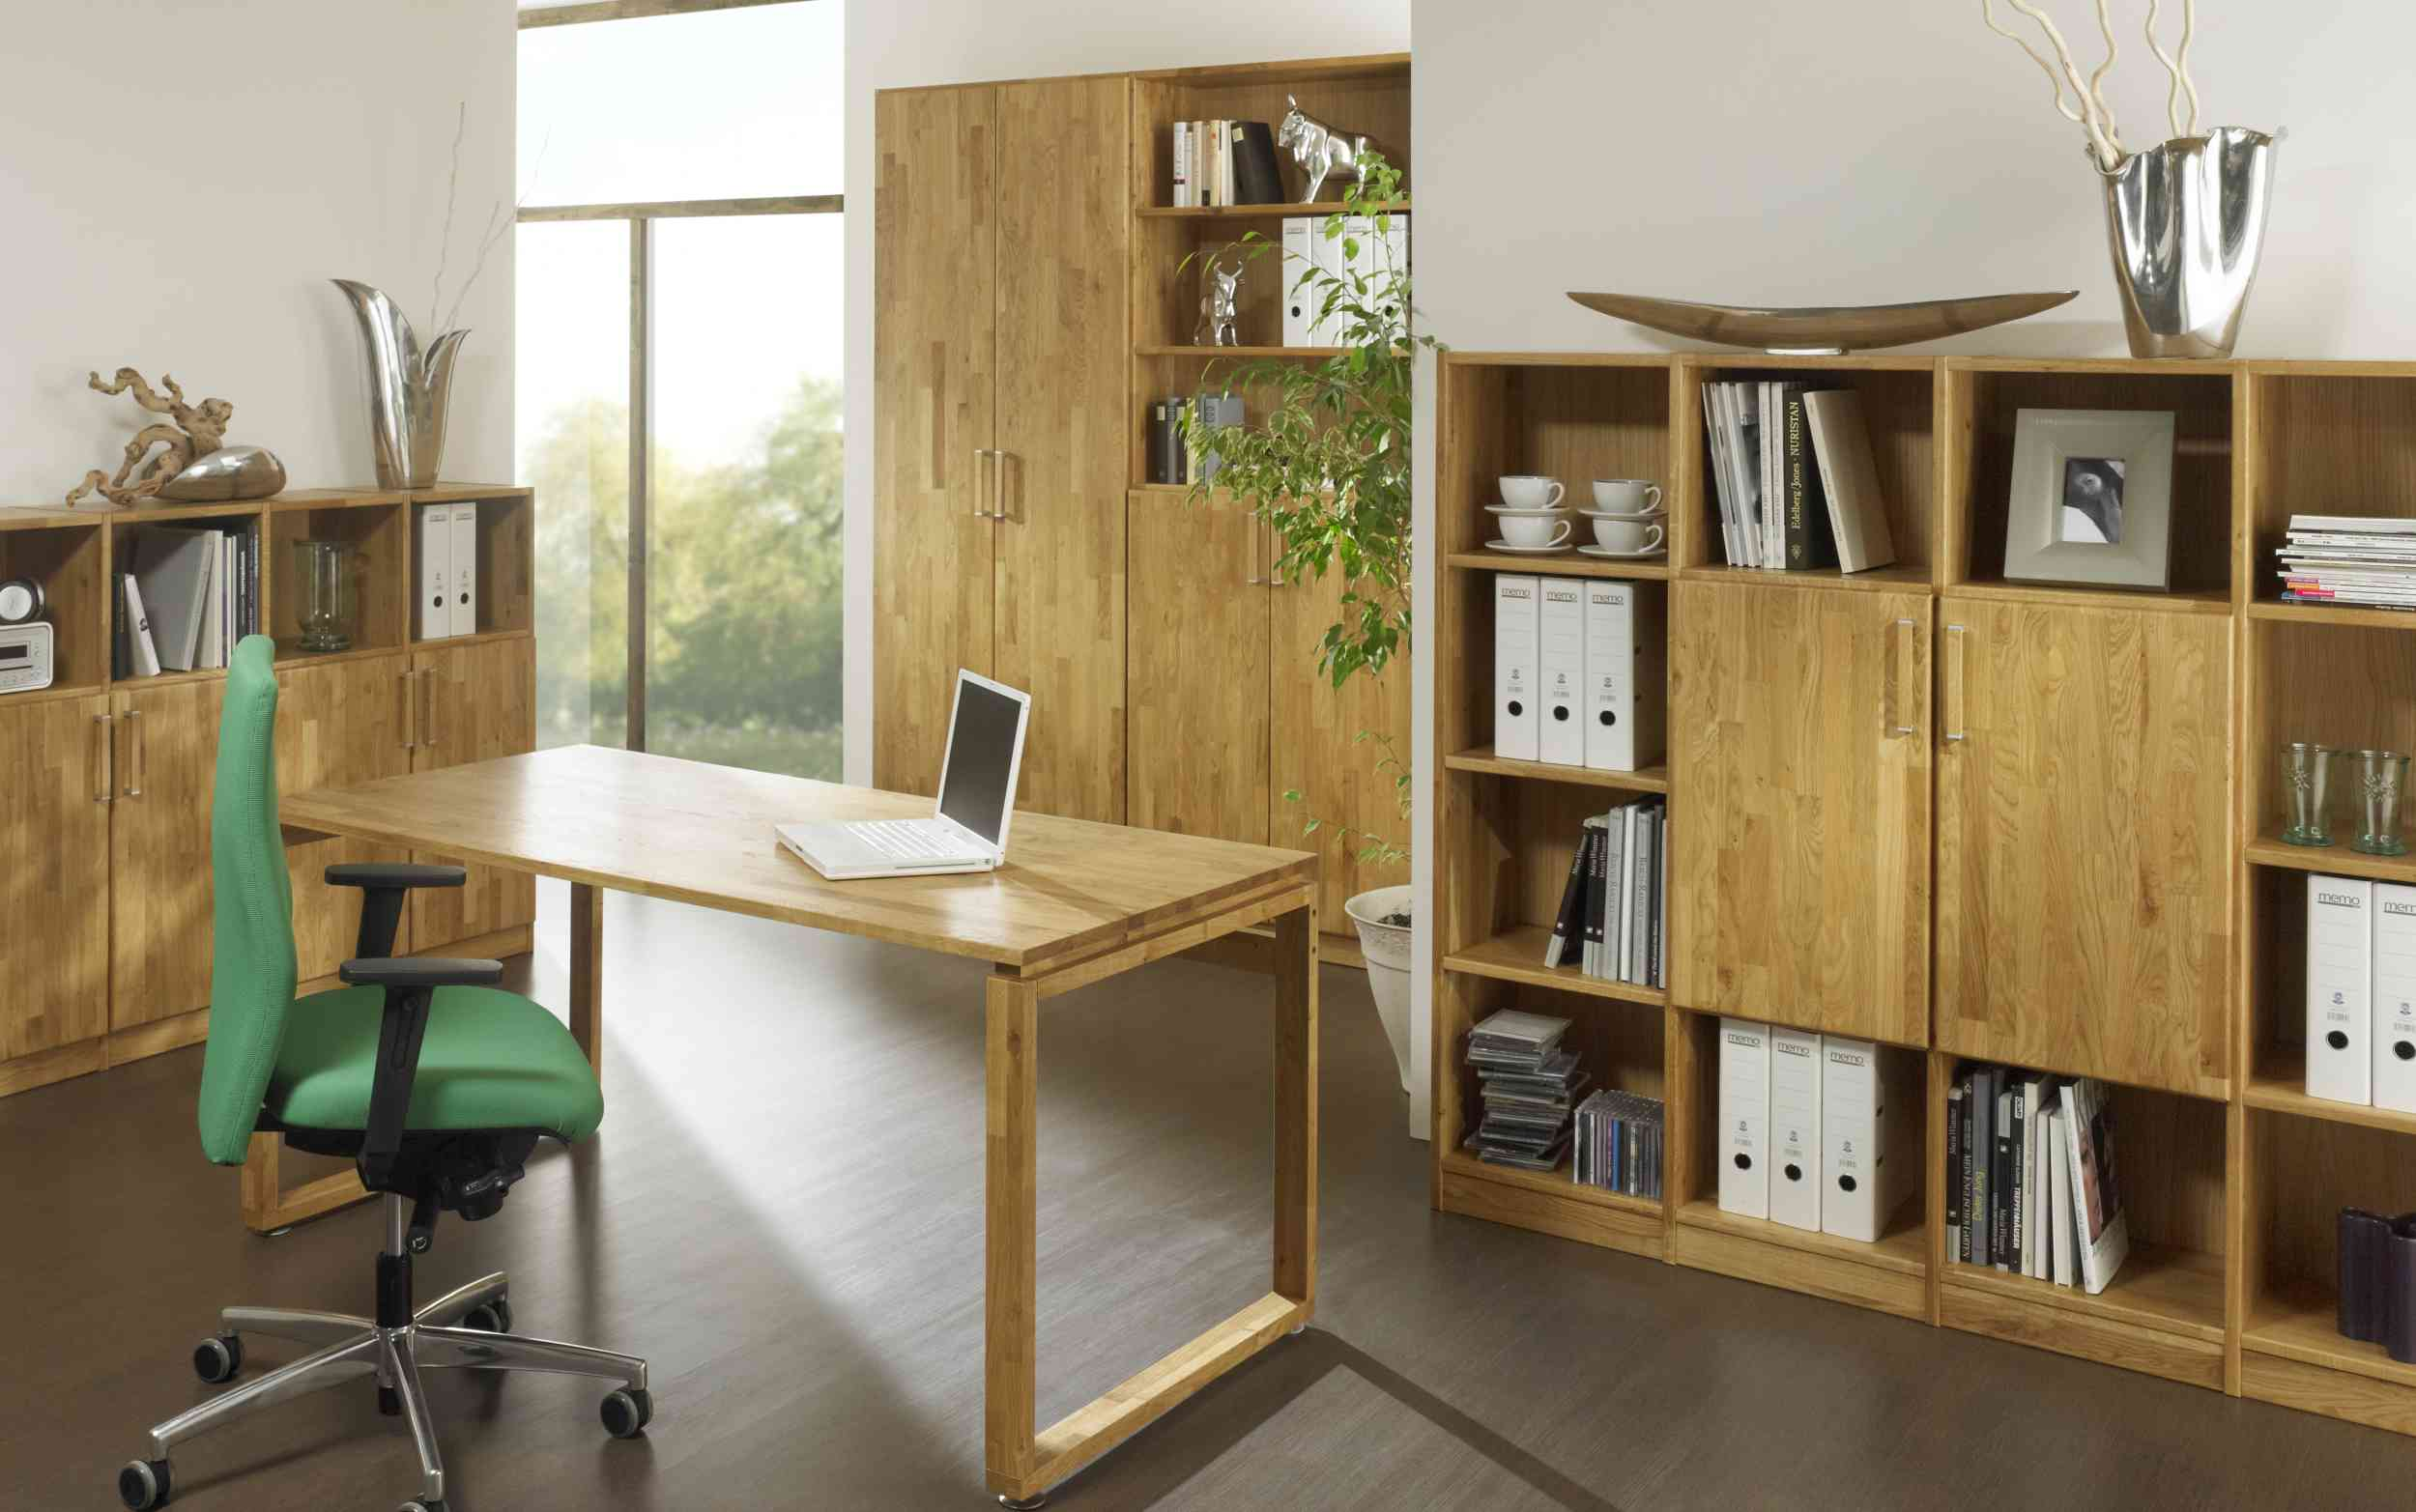 gardinen ideen bilder. Black Bedroom Furniture Sets. Home Design Ideas